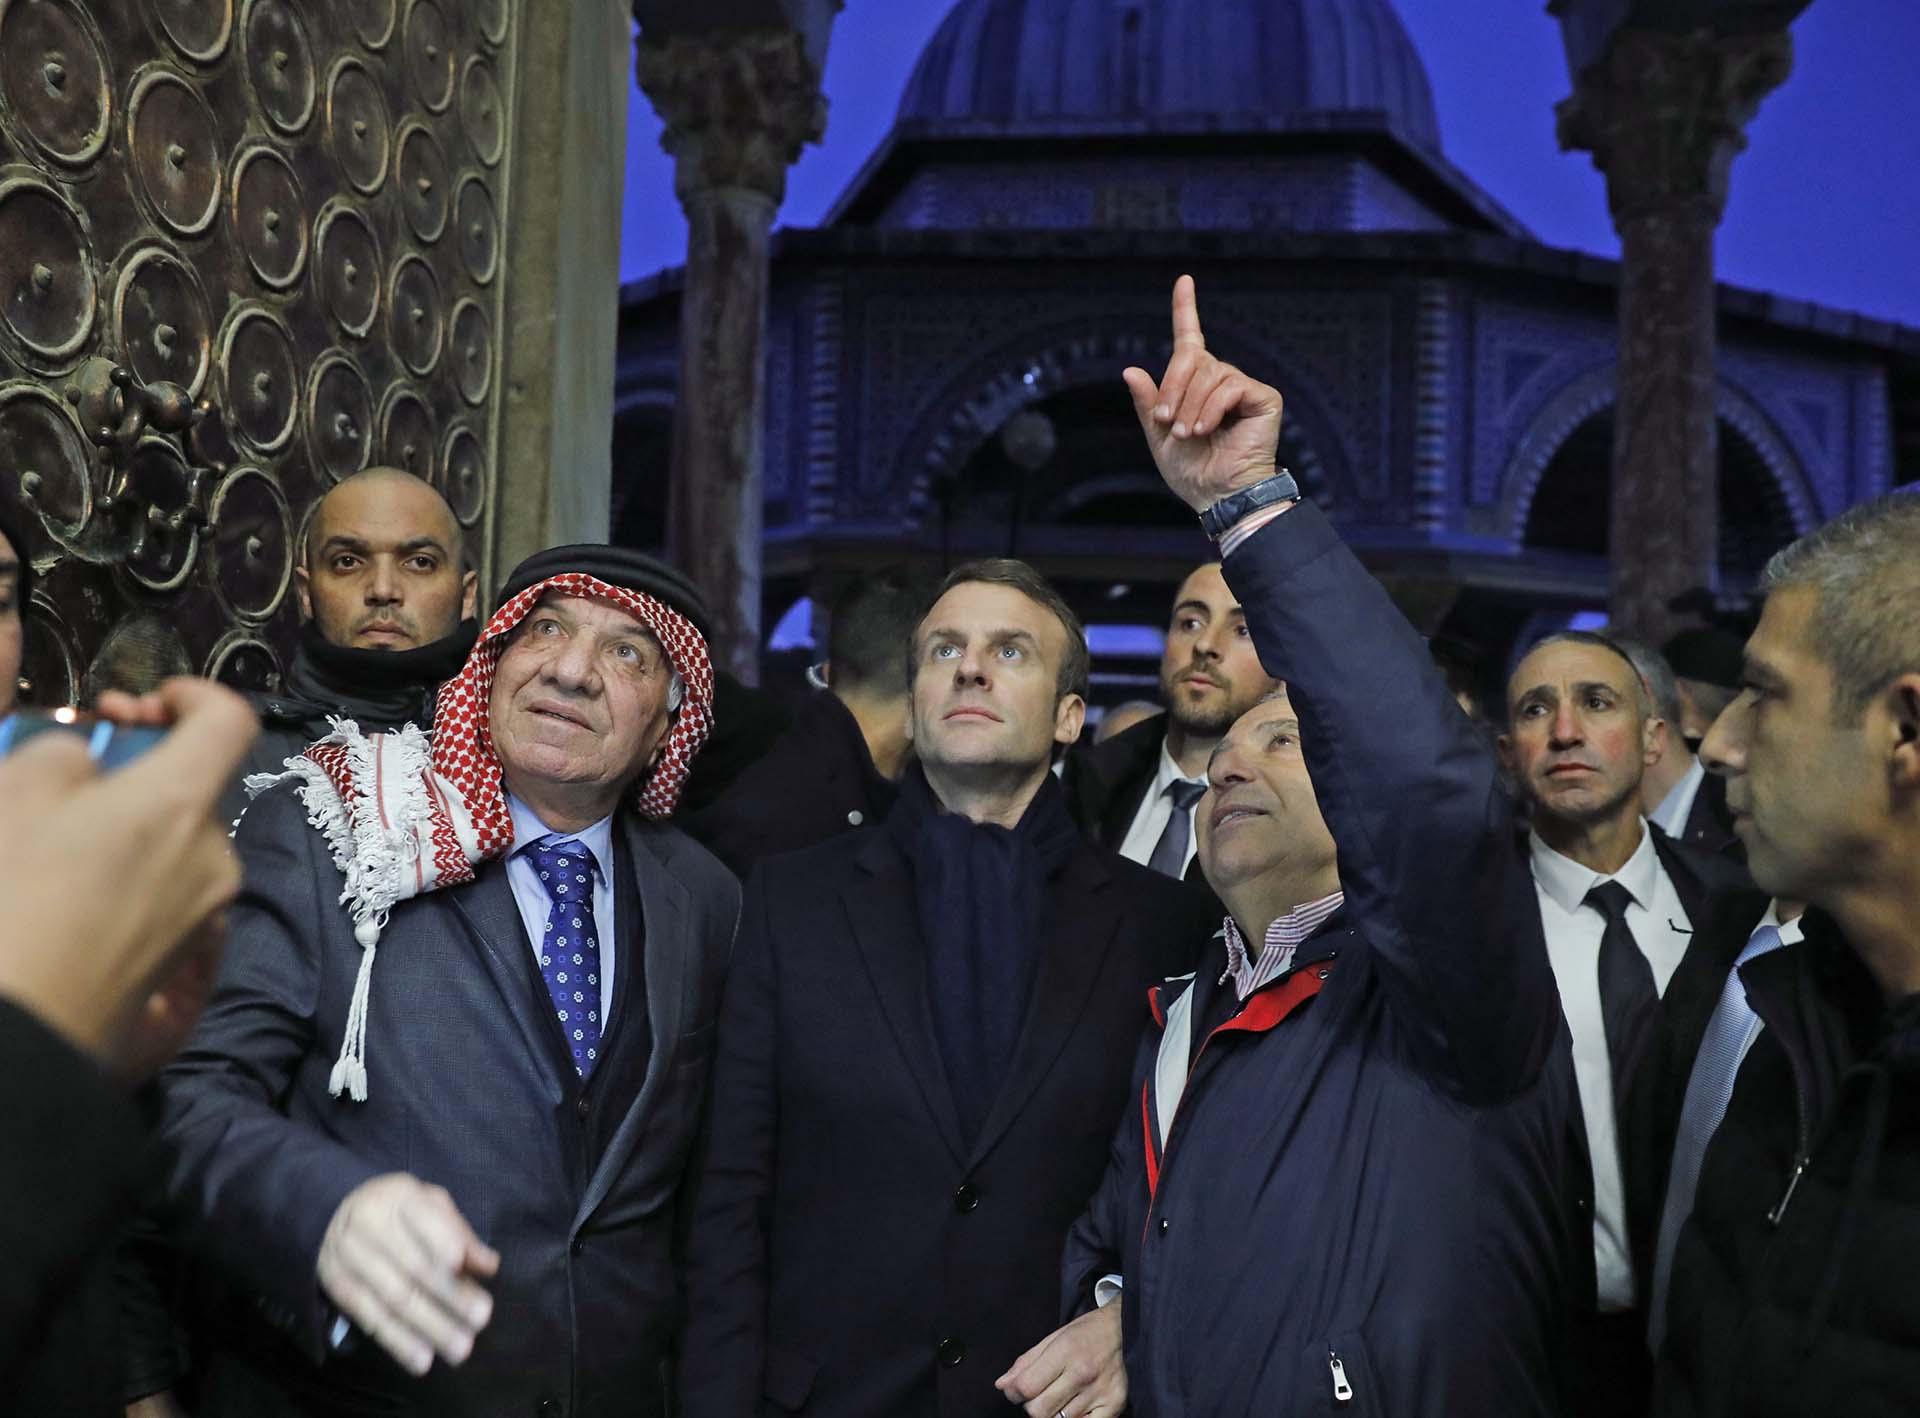 Macron visita la mezquita de Al-Aqsa, en Jerusalén (Photo by Ahmad GHARABLI / AFP)